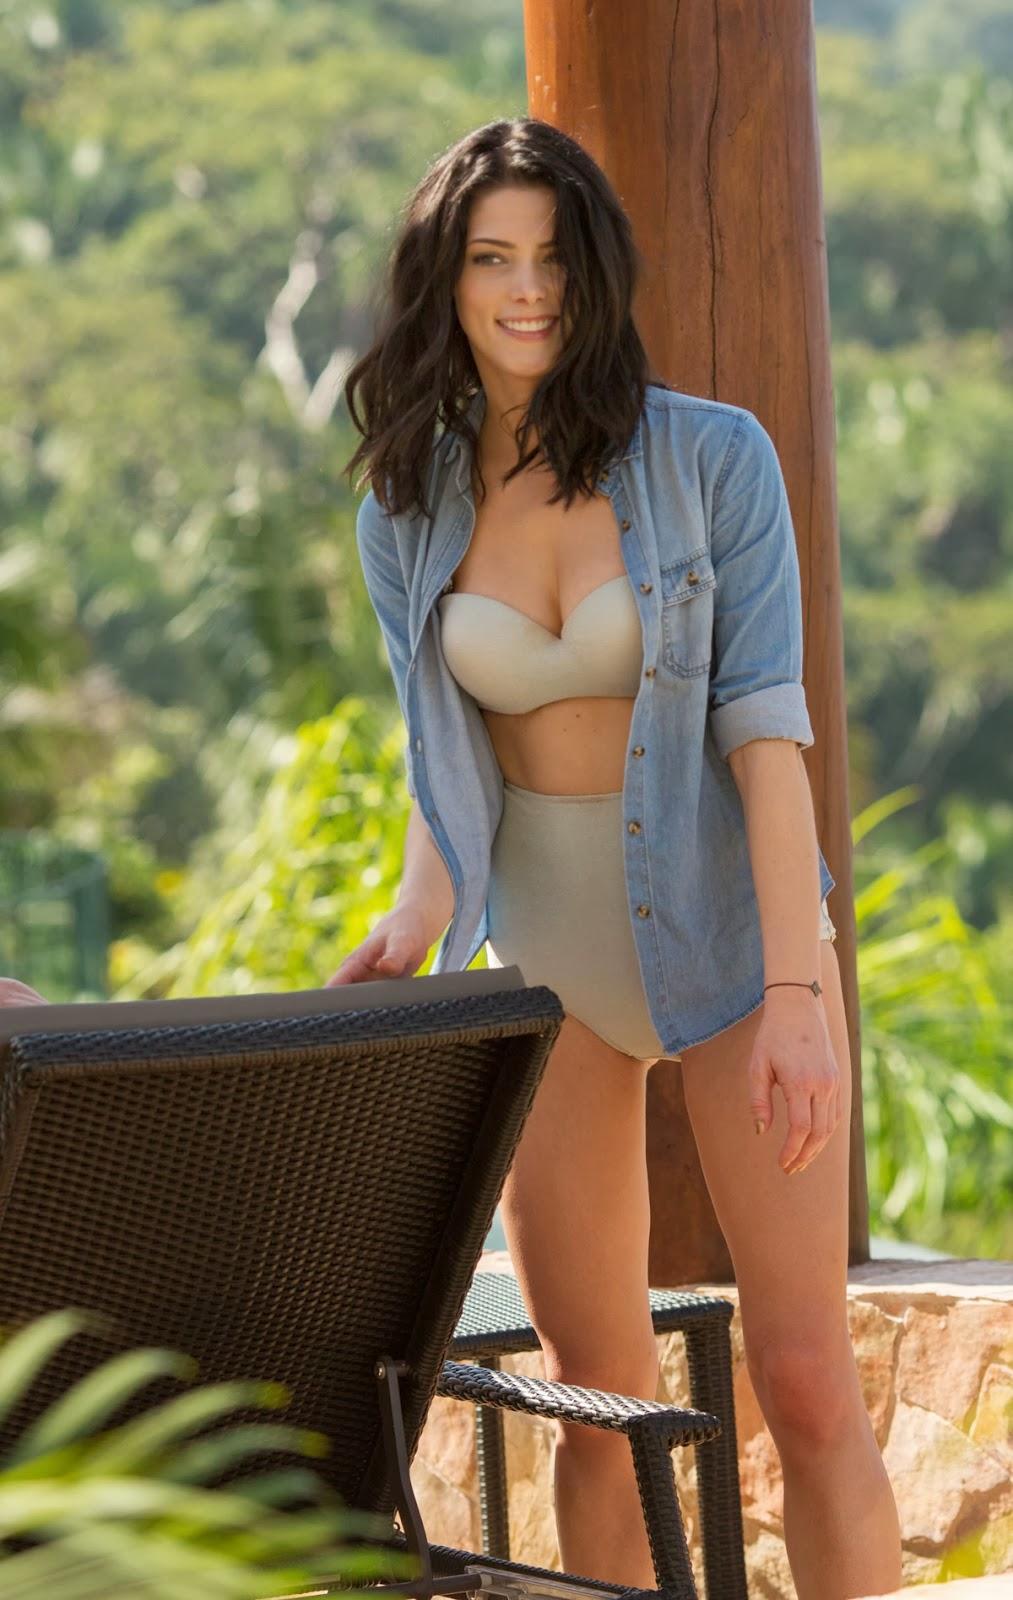 Latest Celebrity Photos: Ashley Greene Sexy and Hot Bikini ...